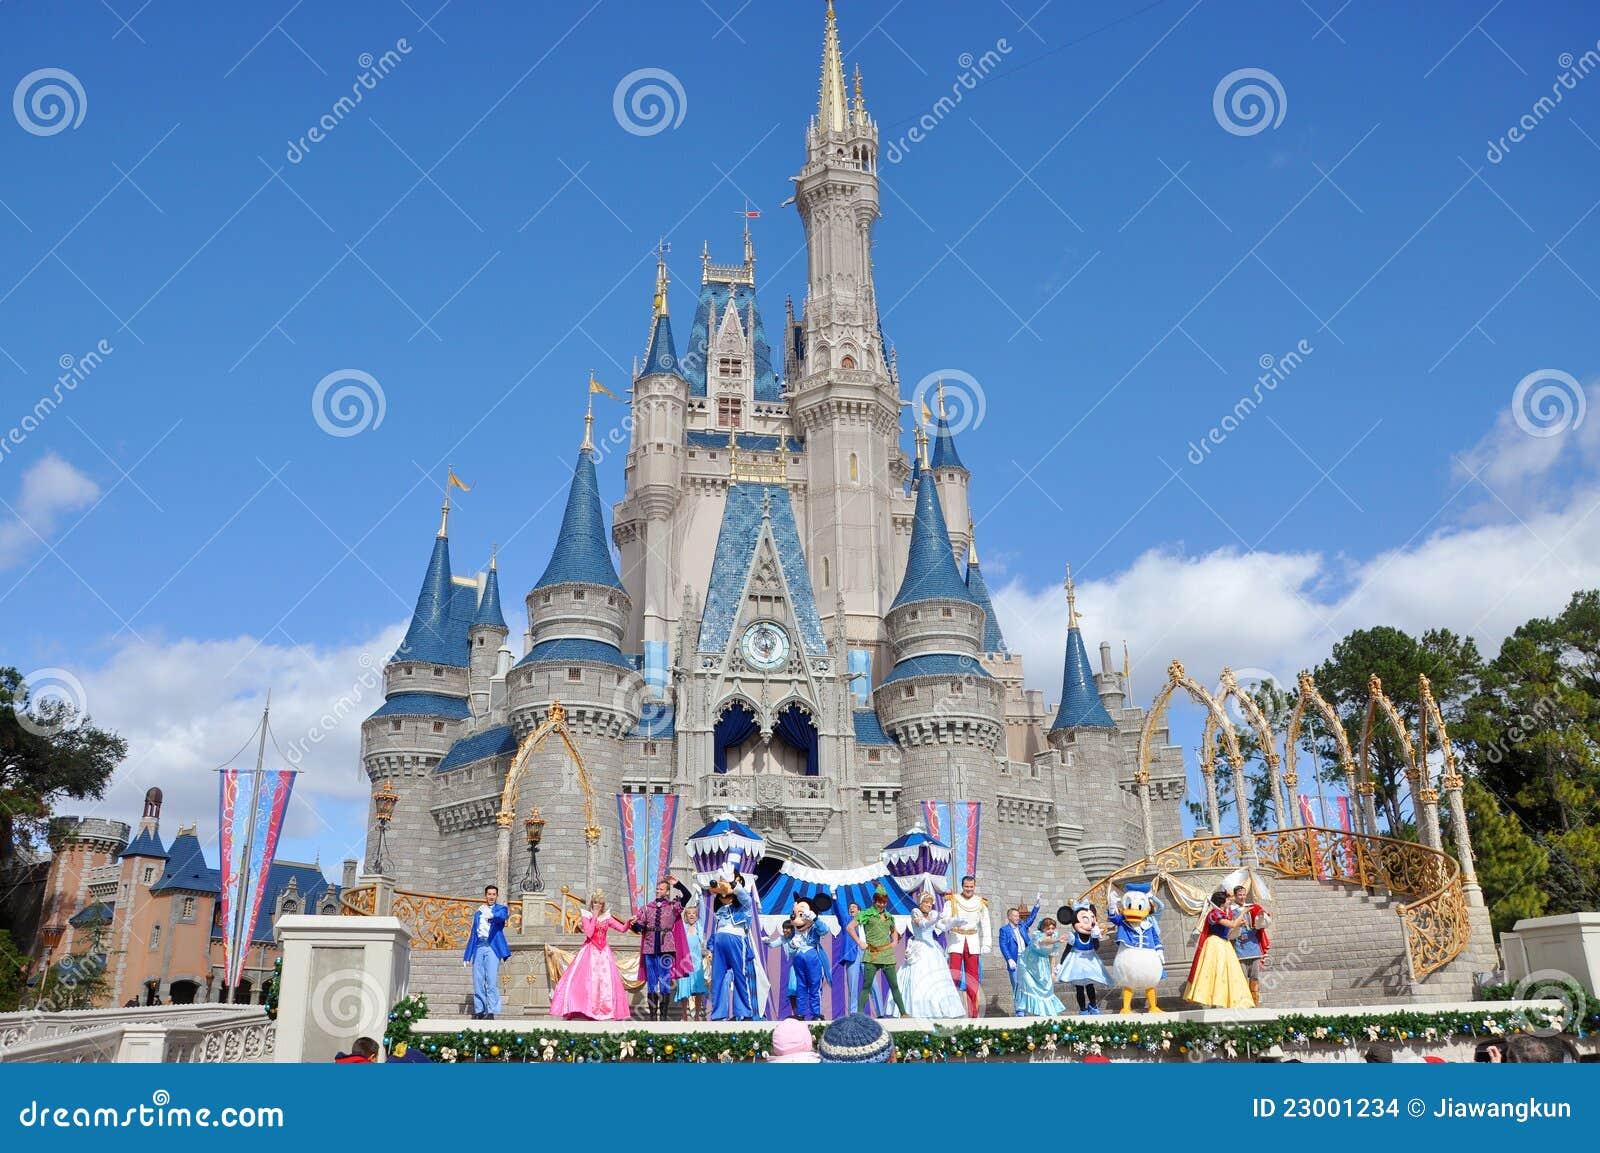 Disney cinderella castle walt disney world editorial stock image